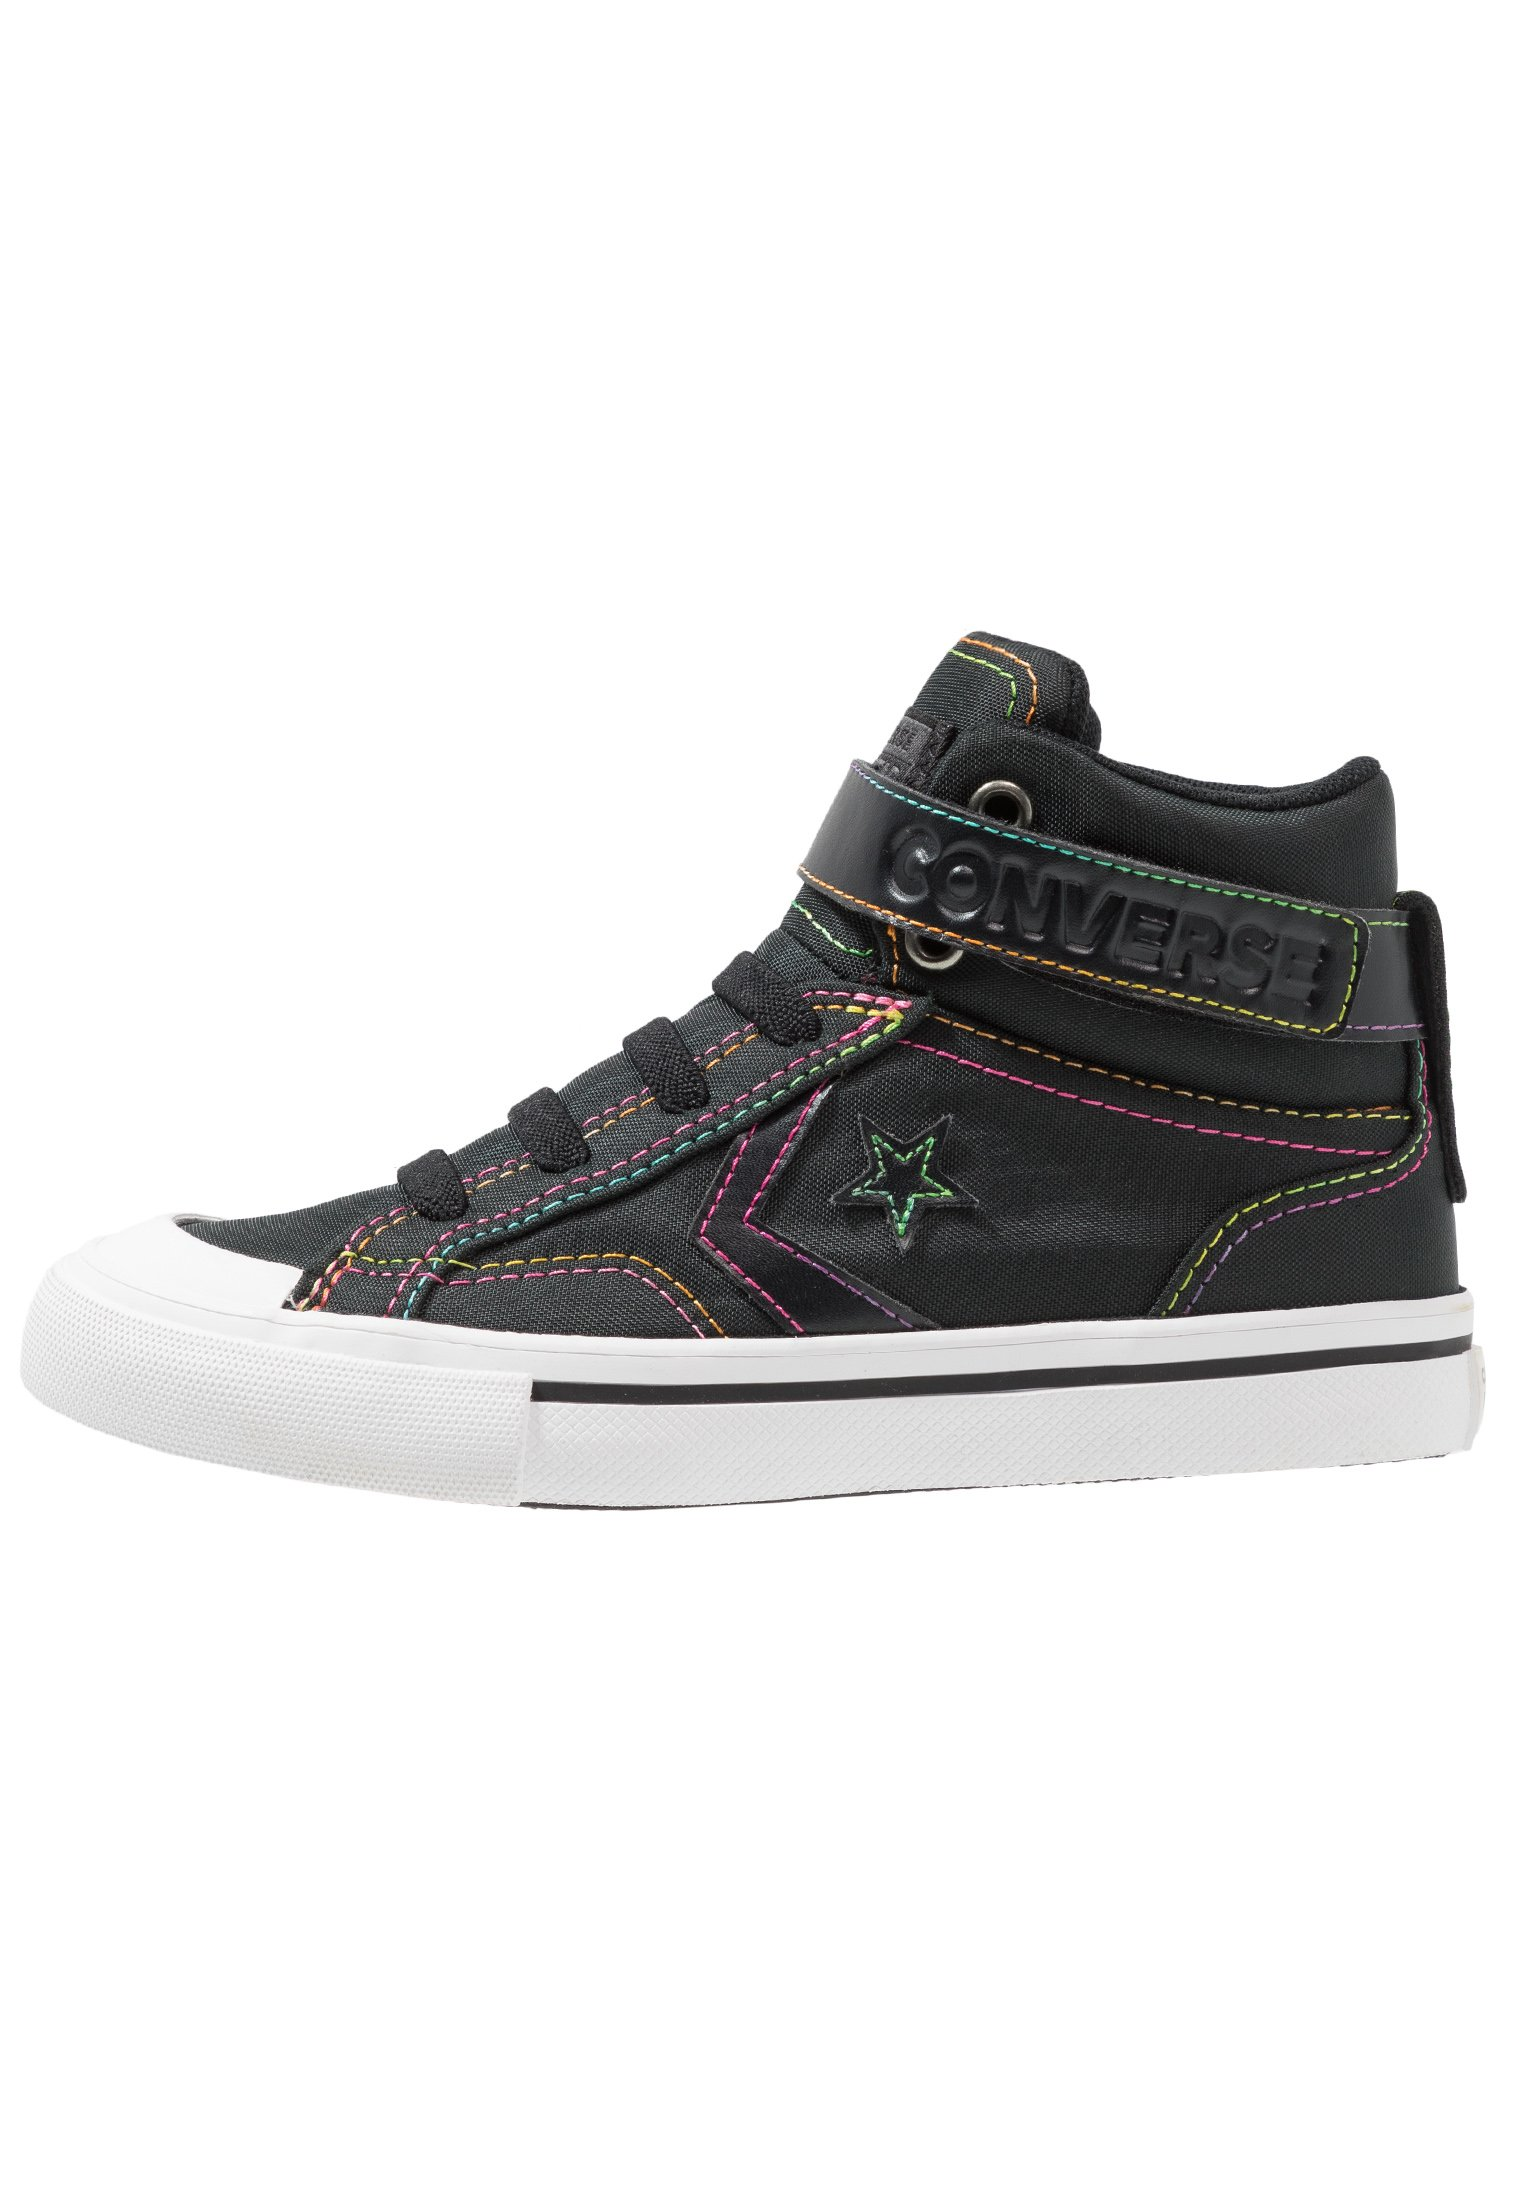 chaussure stitch converse